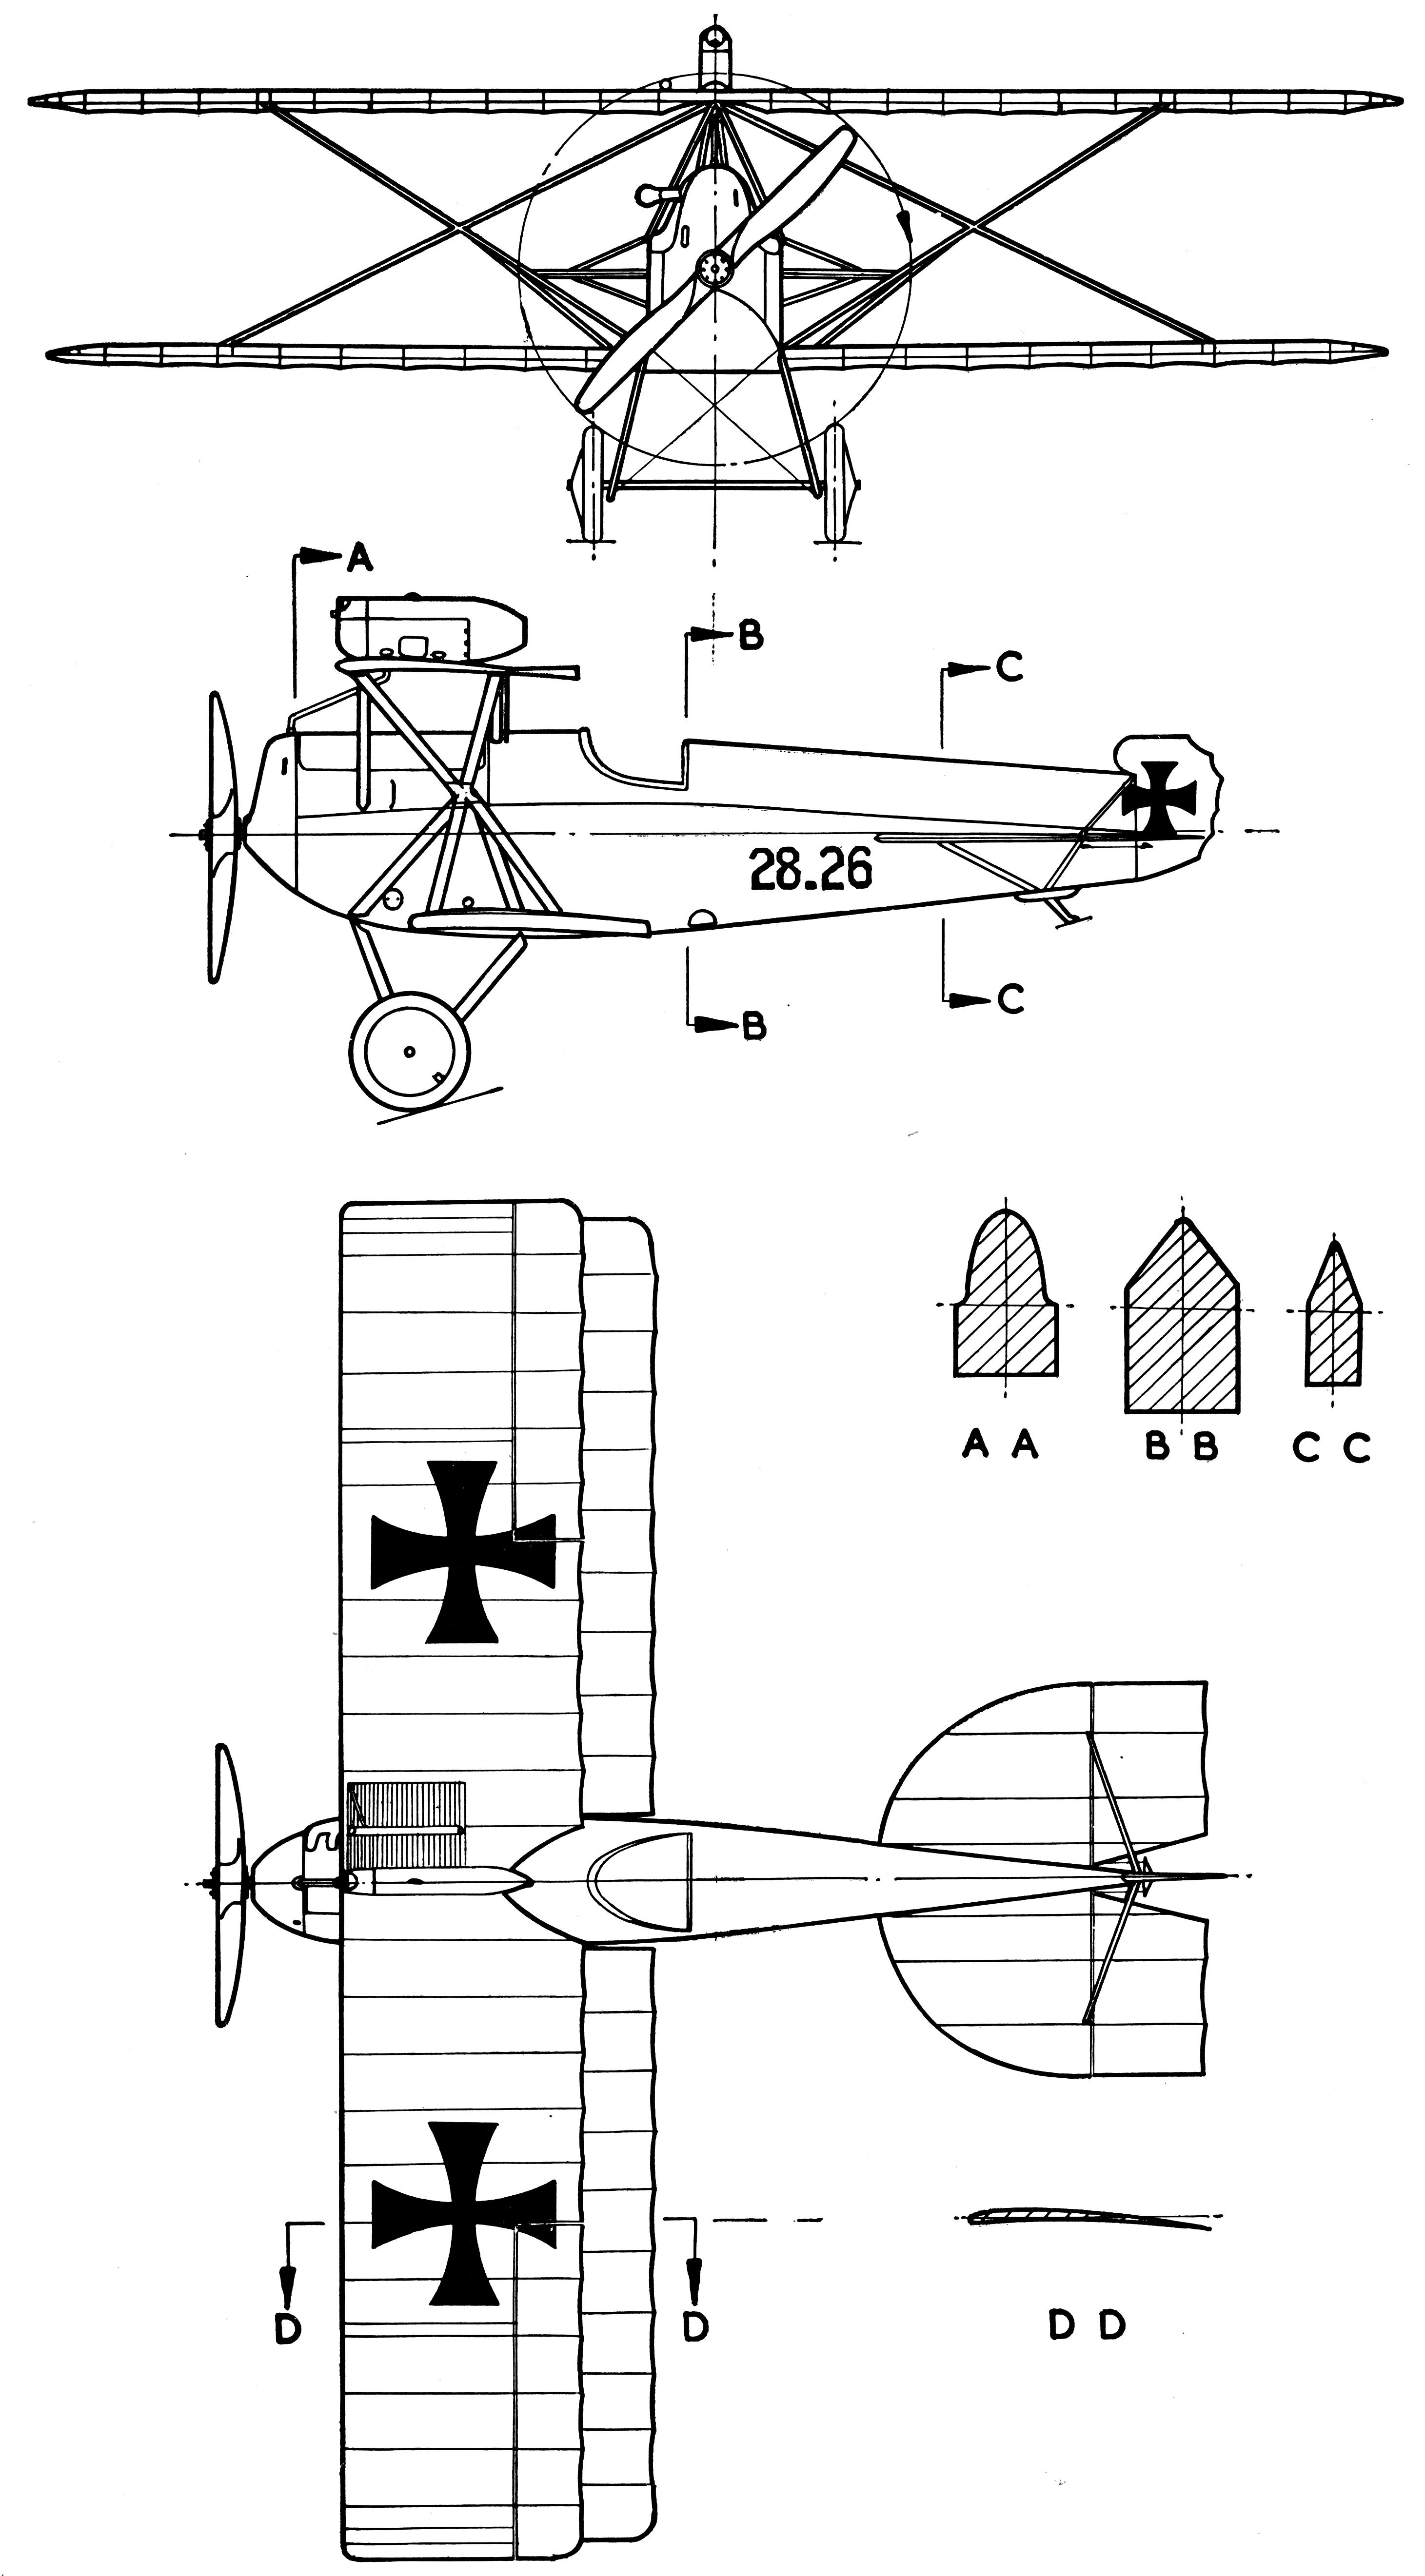 Hansa-Brandenburg D.I blueprint